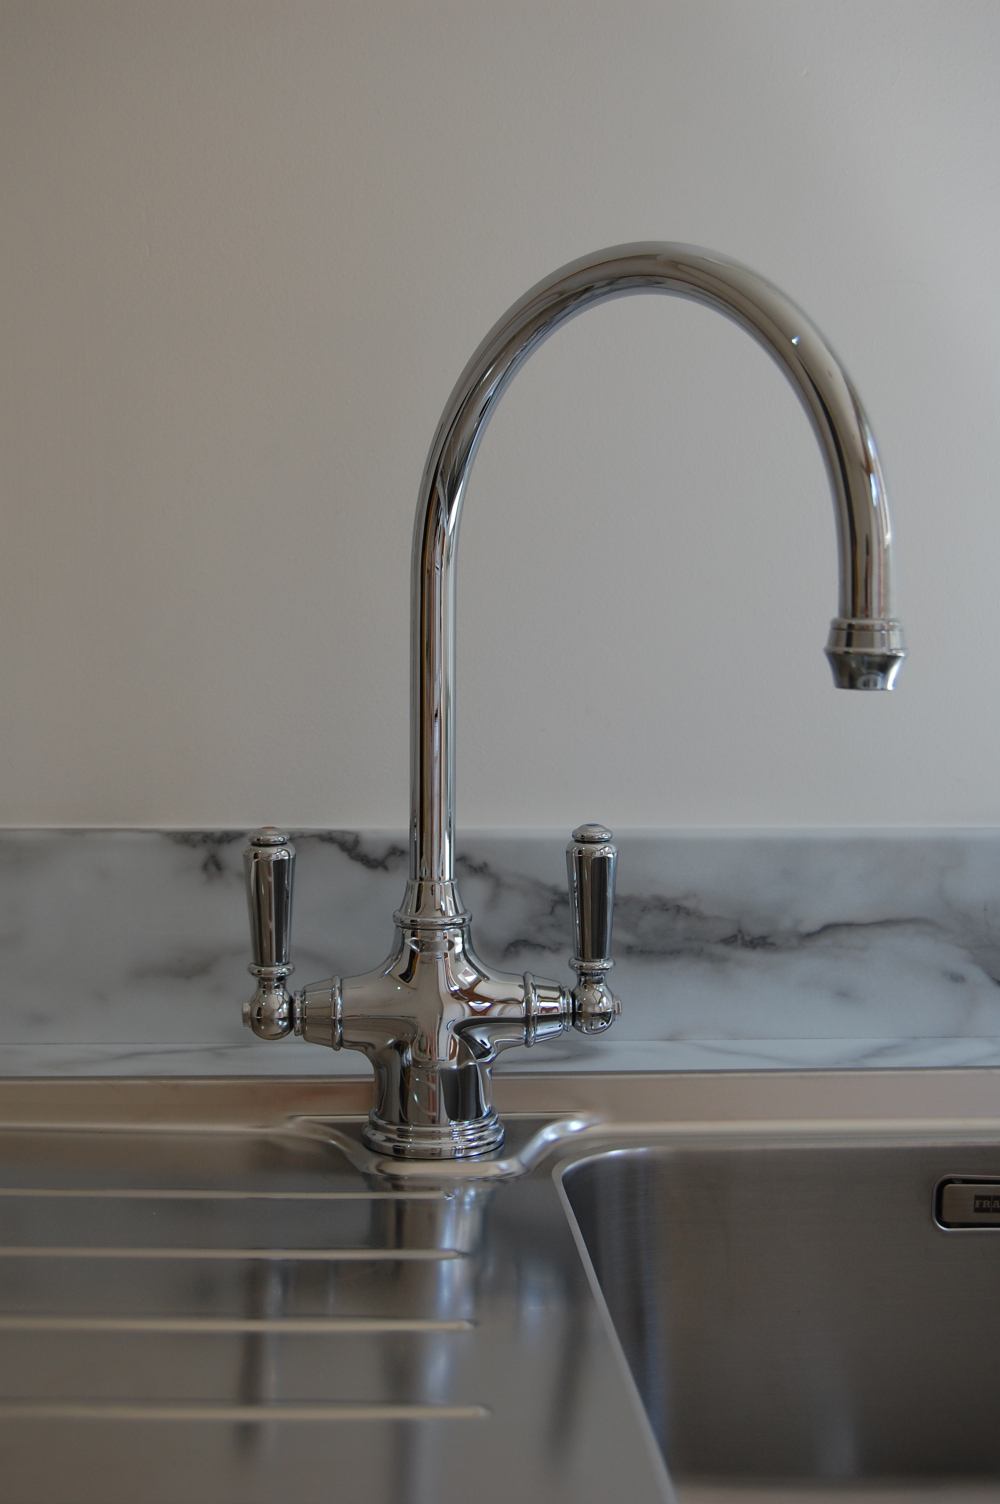 designer-polished-chrome-taps.jpg